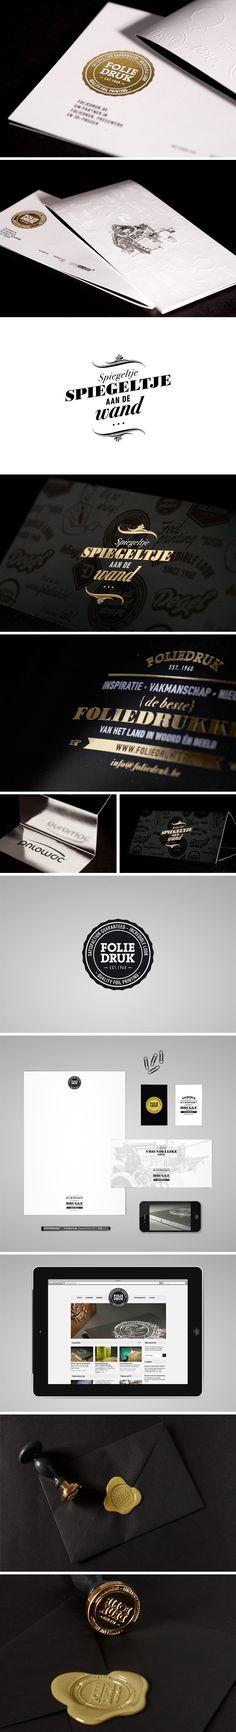 Foliedruk identity   by skinn